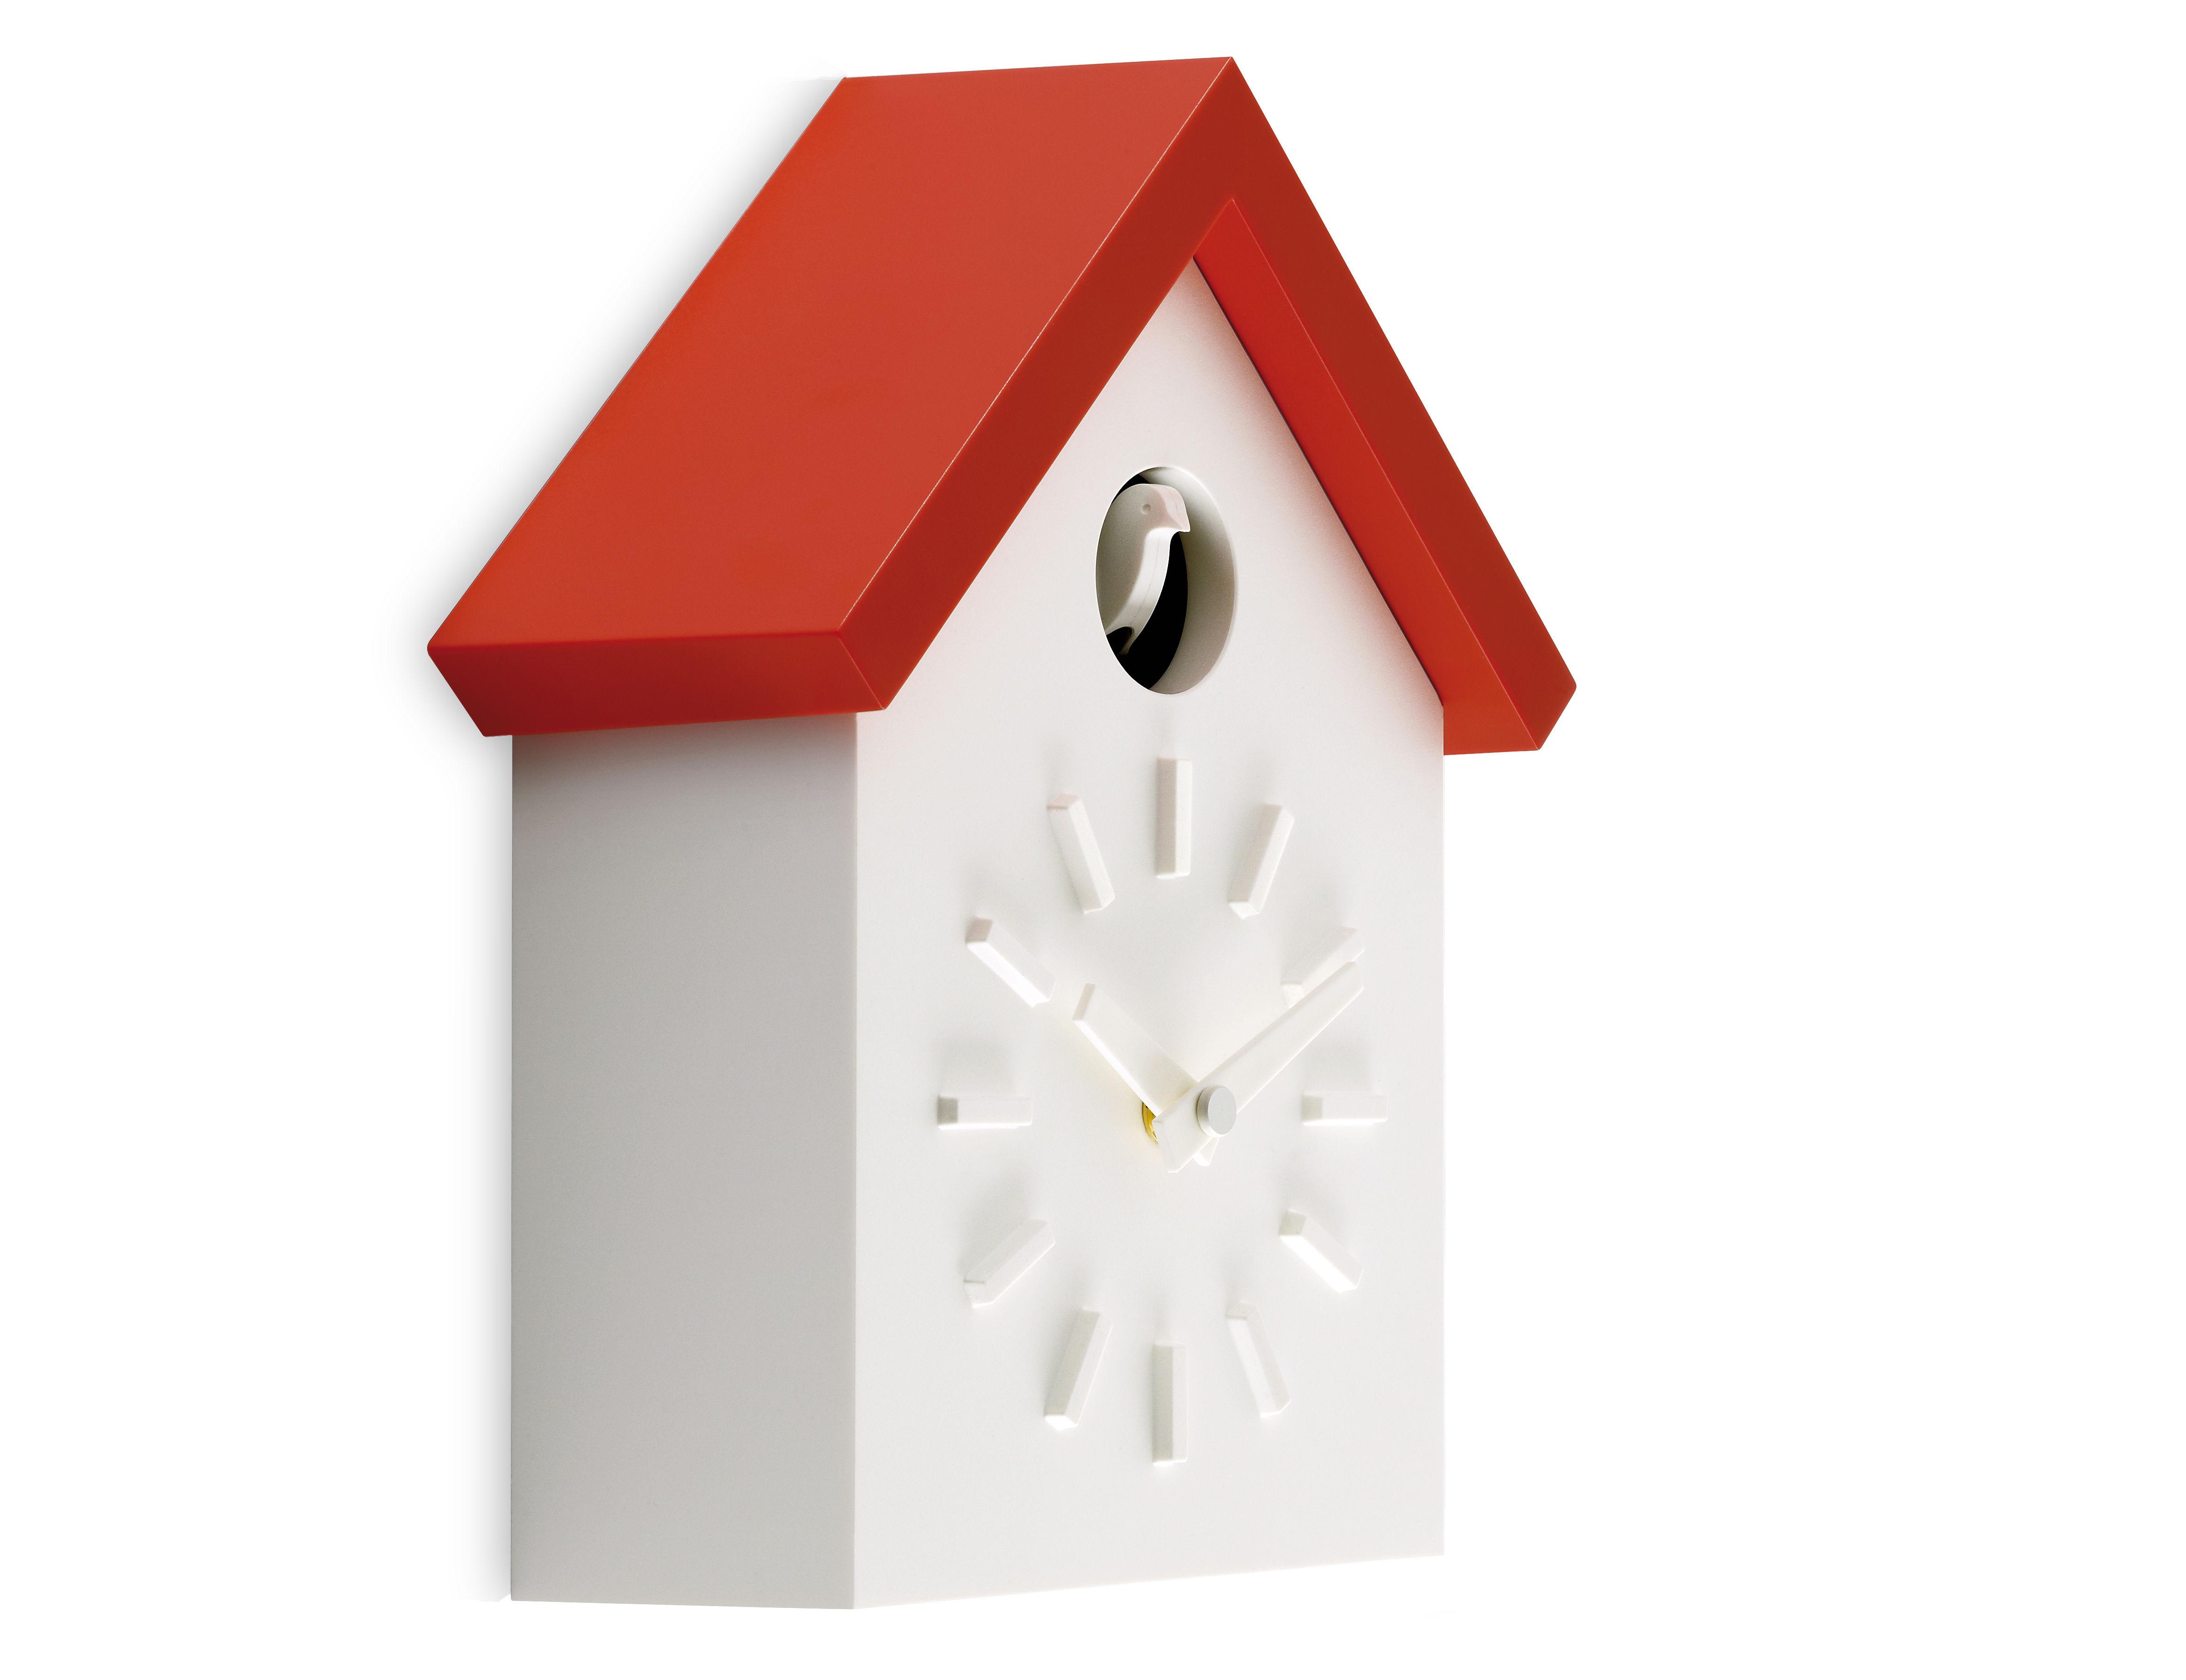 Déco - Horloges  - Horloge murale Cu-Clock à coucou - Magis - Orange - ABS